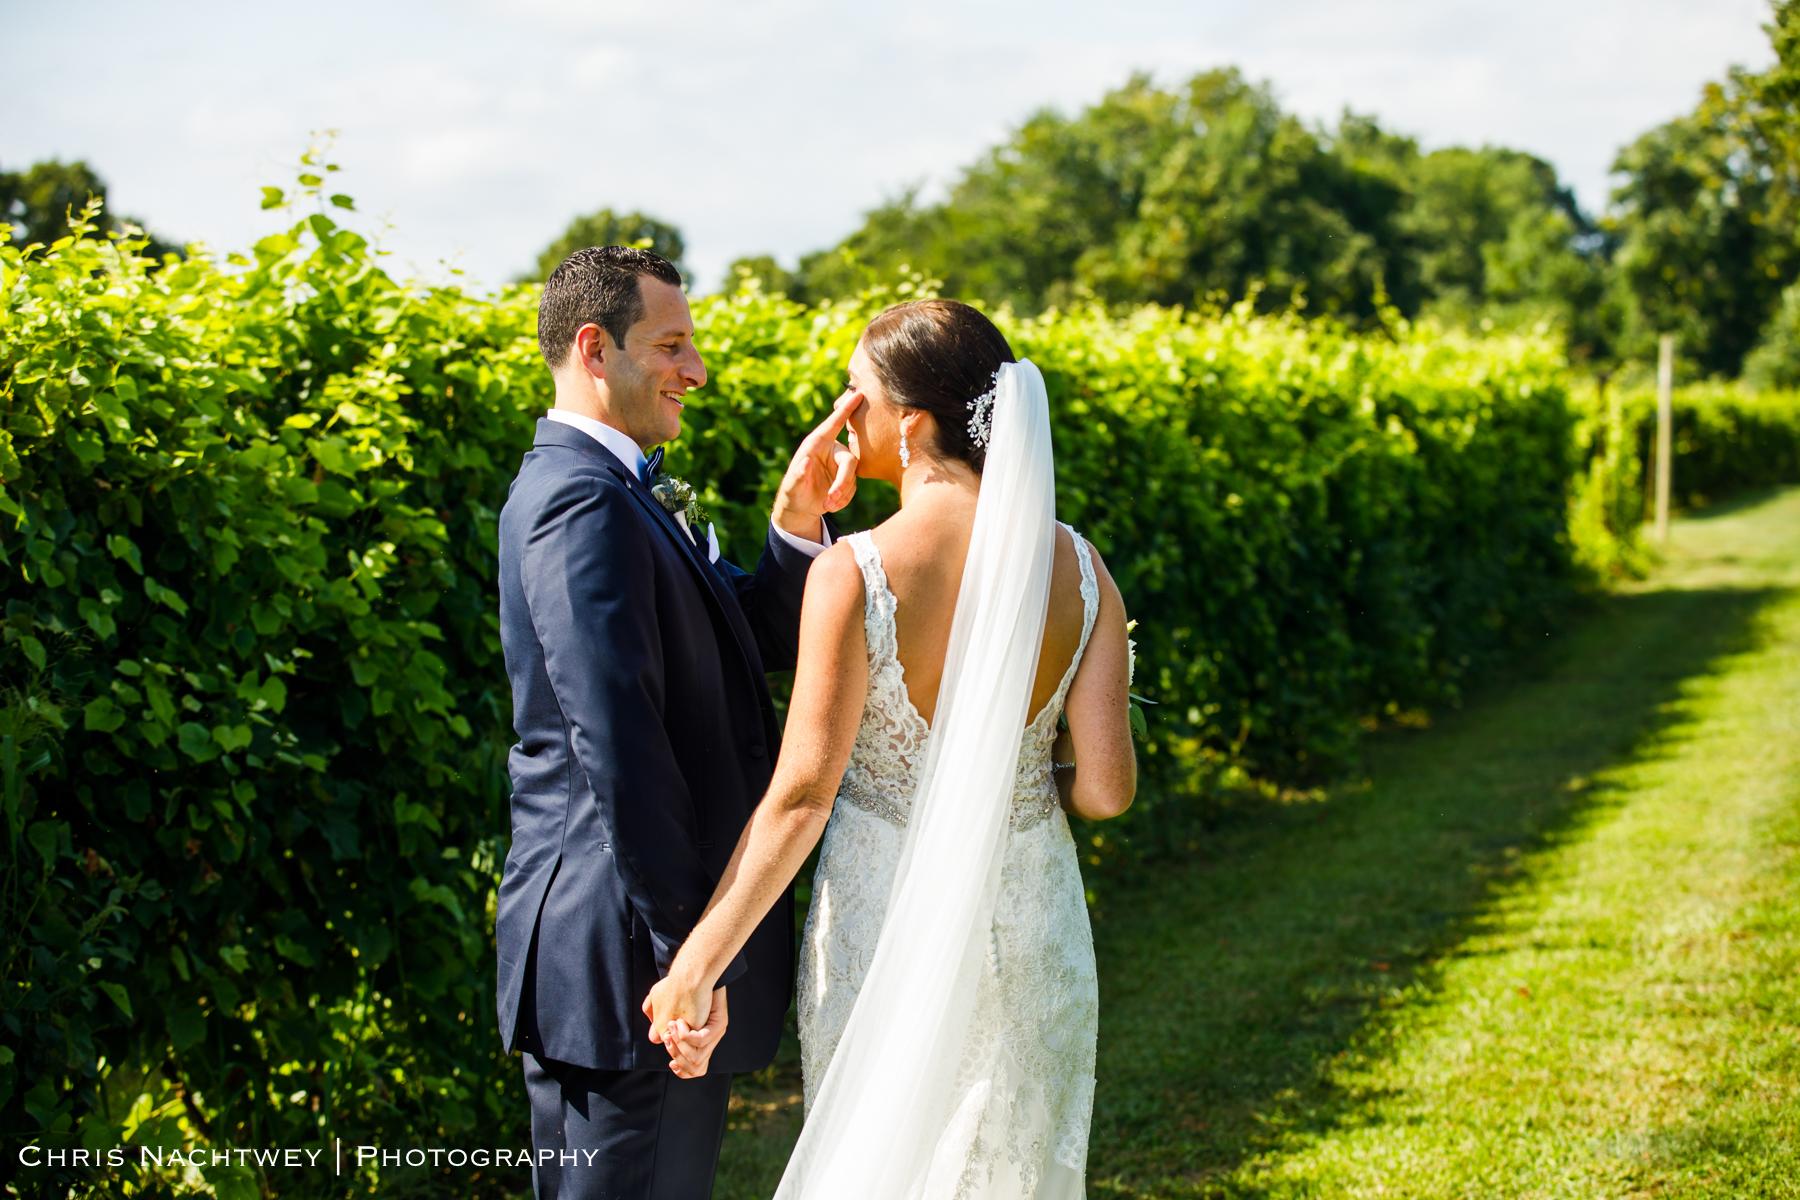 wedding-lake-of-isles-photos-chris-nachtwey-photography-2019-15.jpg